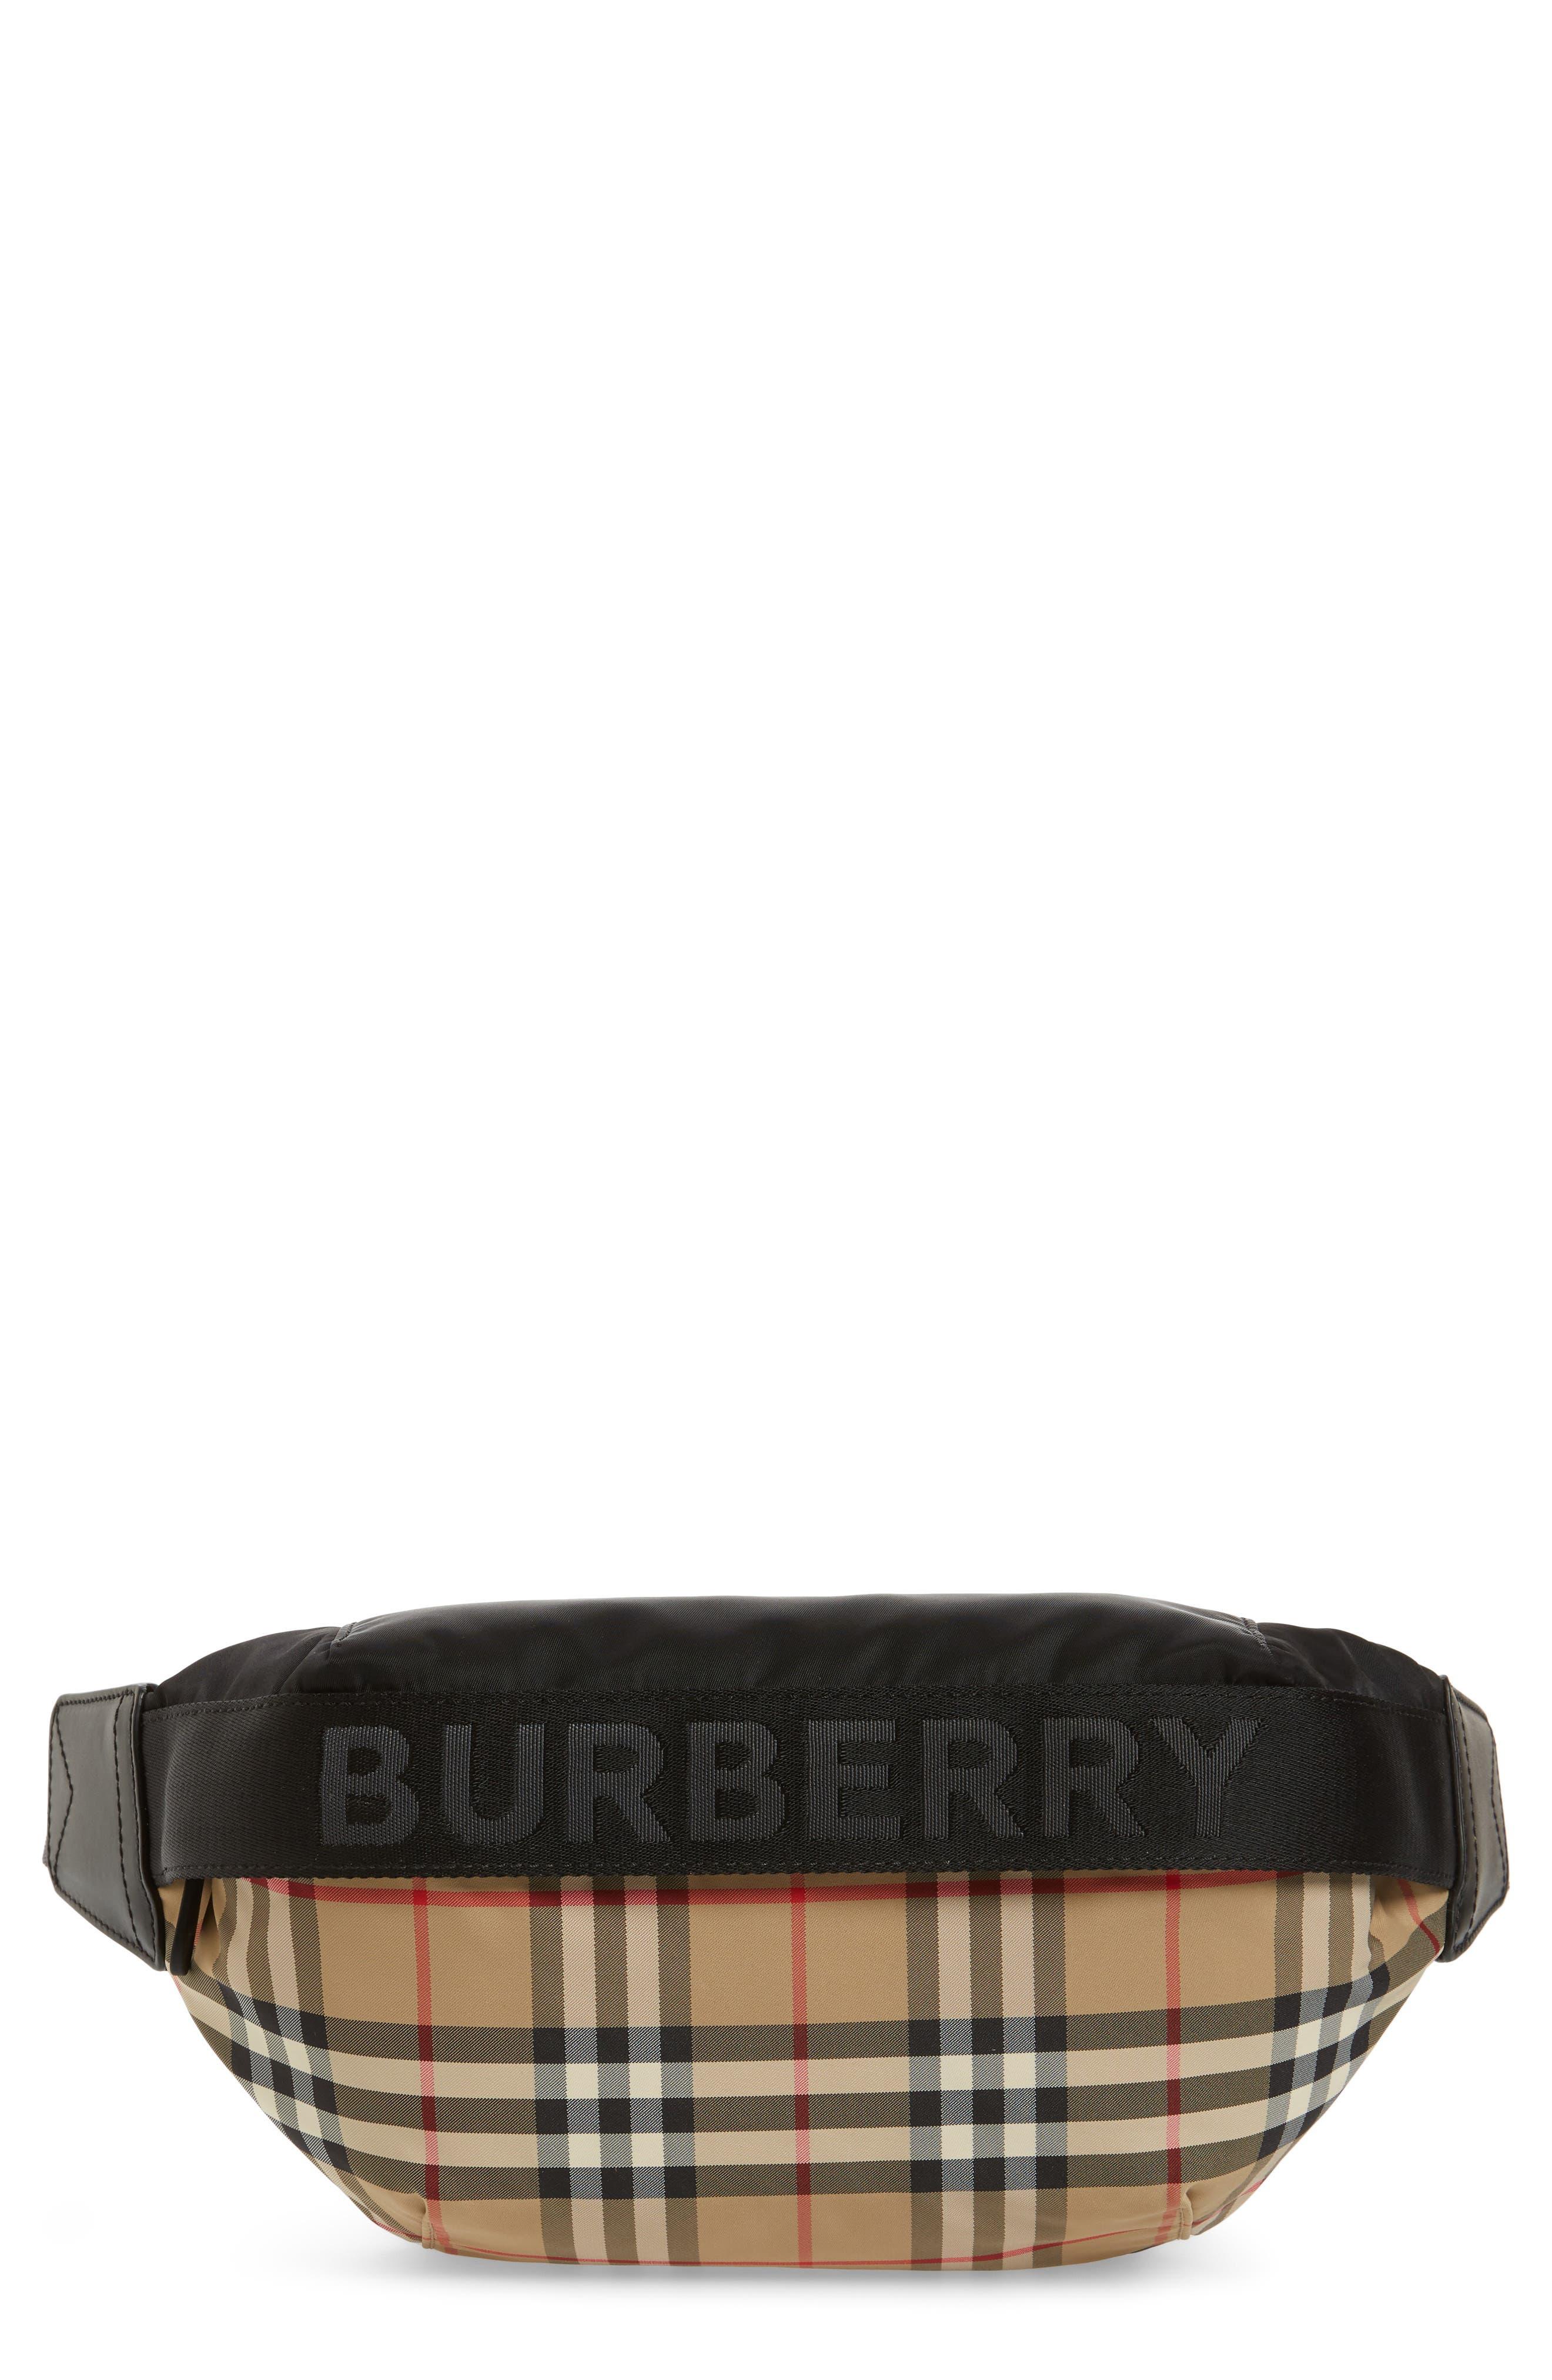 BURBERRY Burberrry Medium Sonny Vintage Check Belt Bag, Main, color, ARCHIVE BEIGE